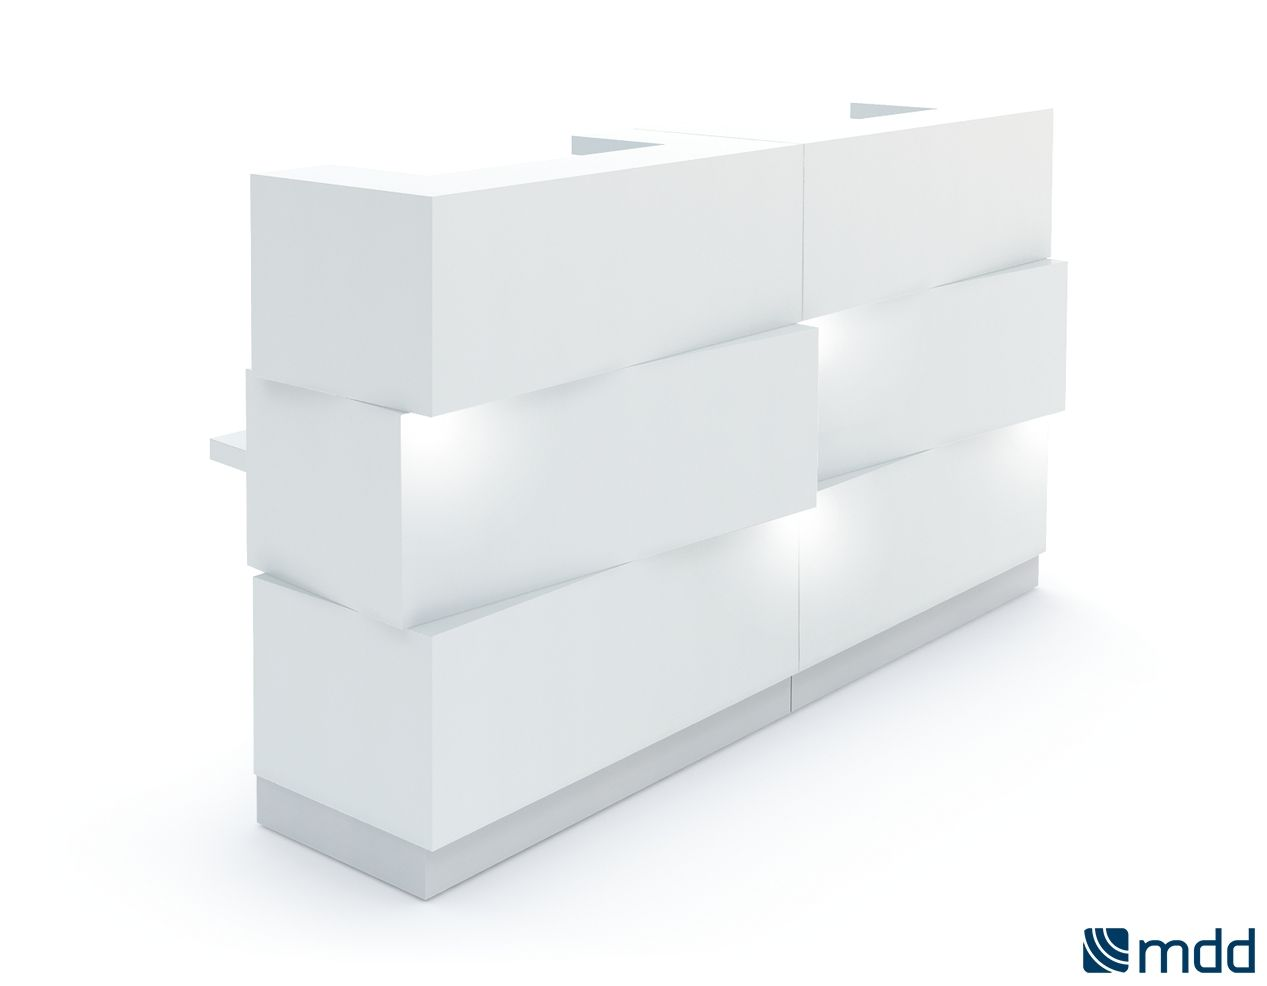 Reception Desks - Zen | MDD | Reception furniture | Glass office desk | Glass office desk